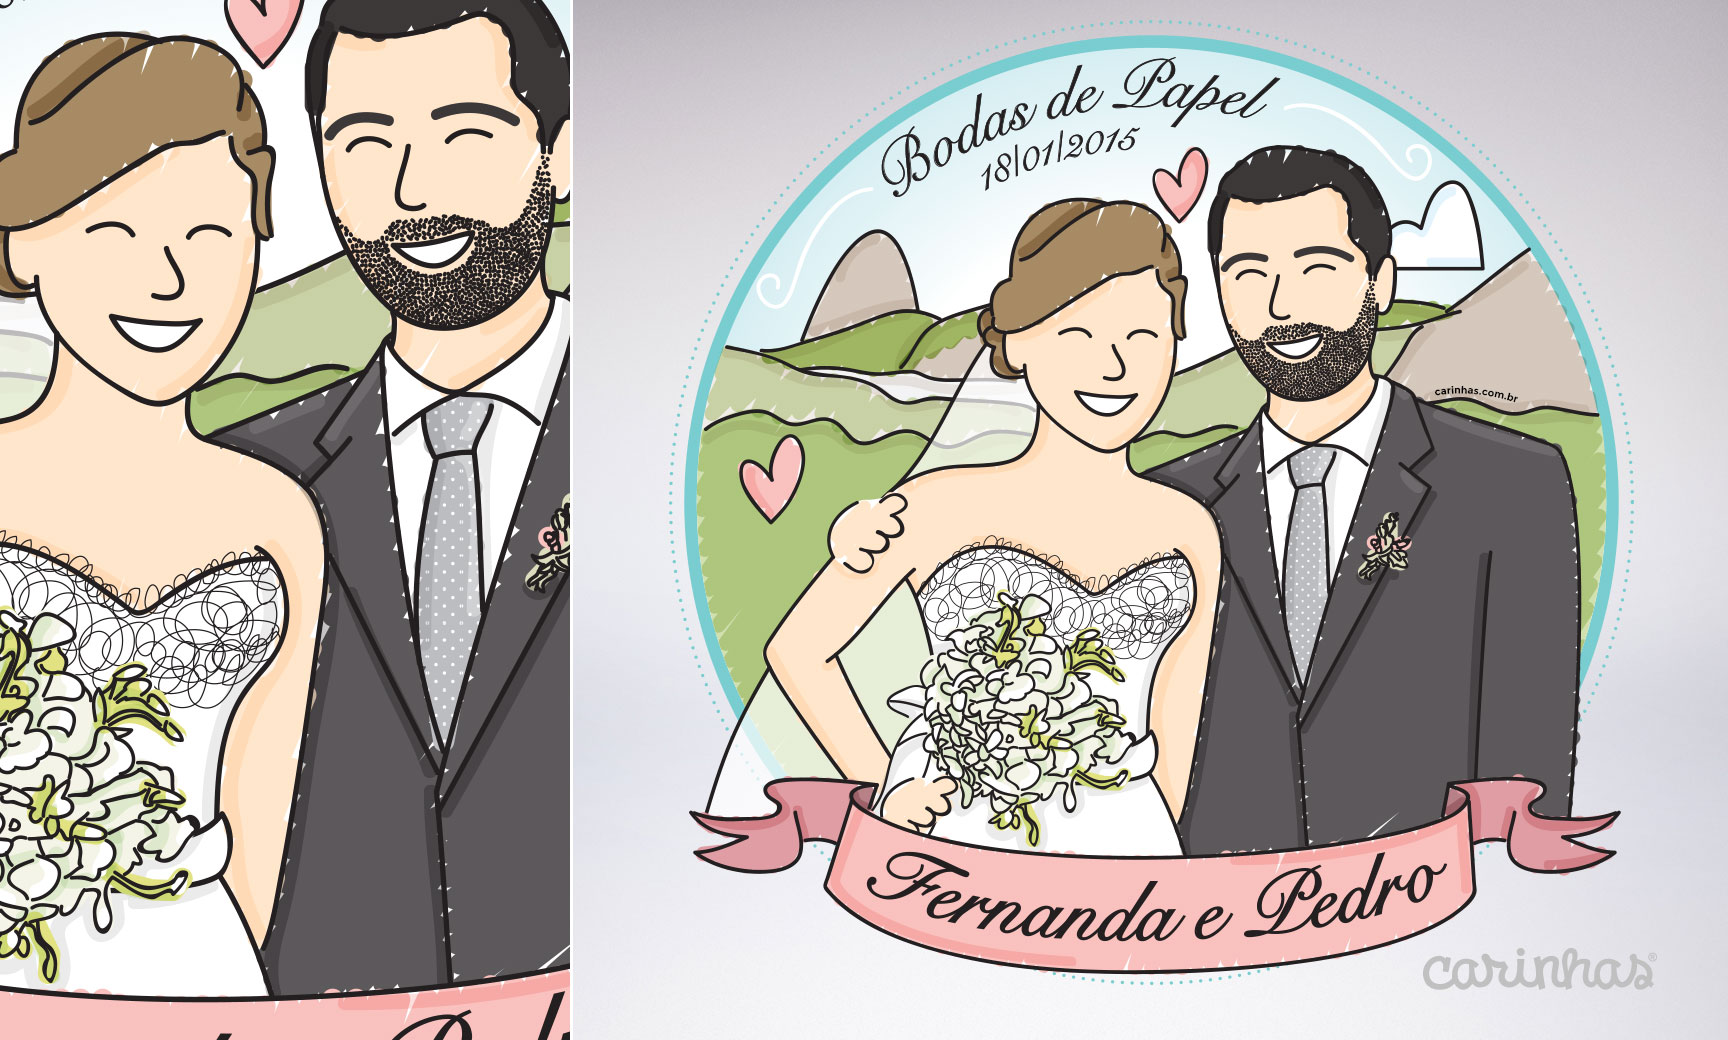 carinhas_fernanda_pedro_17229_post